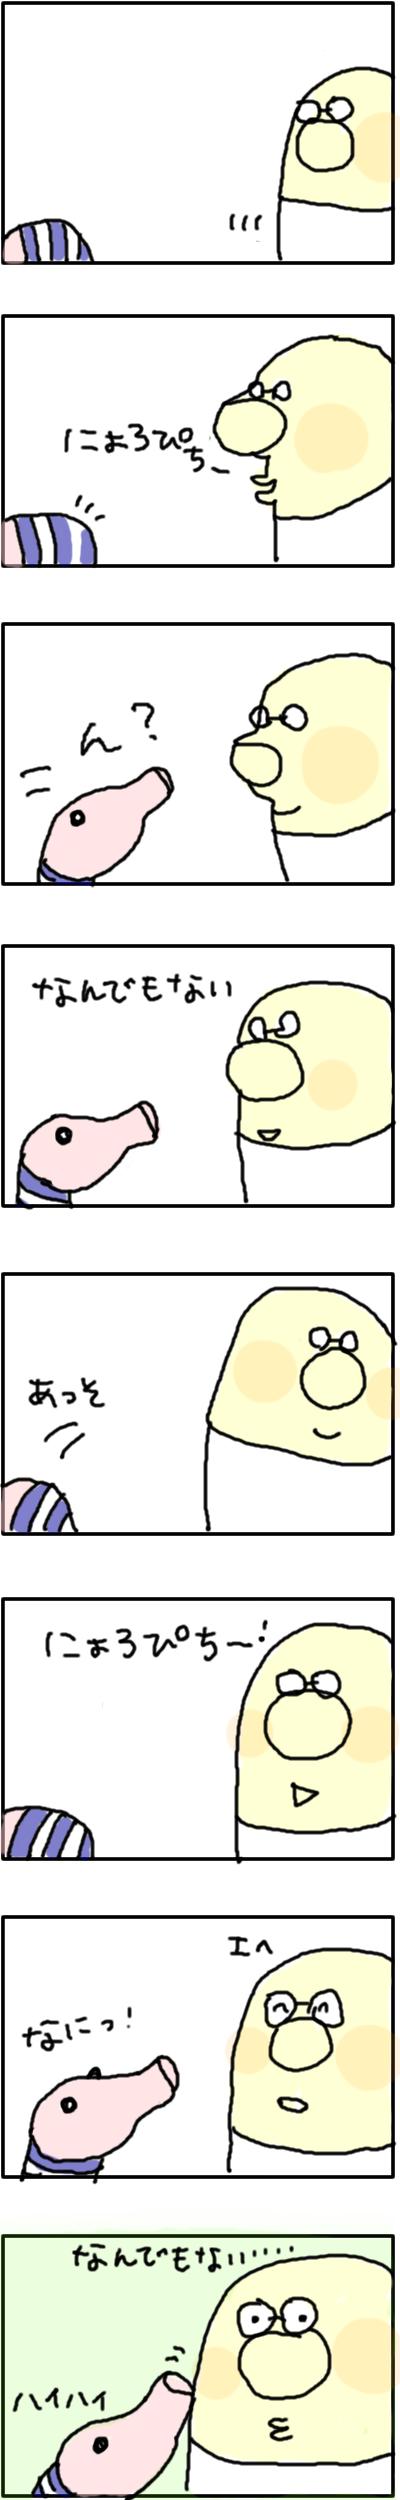 j20110713-001